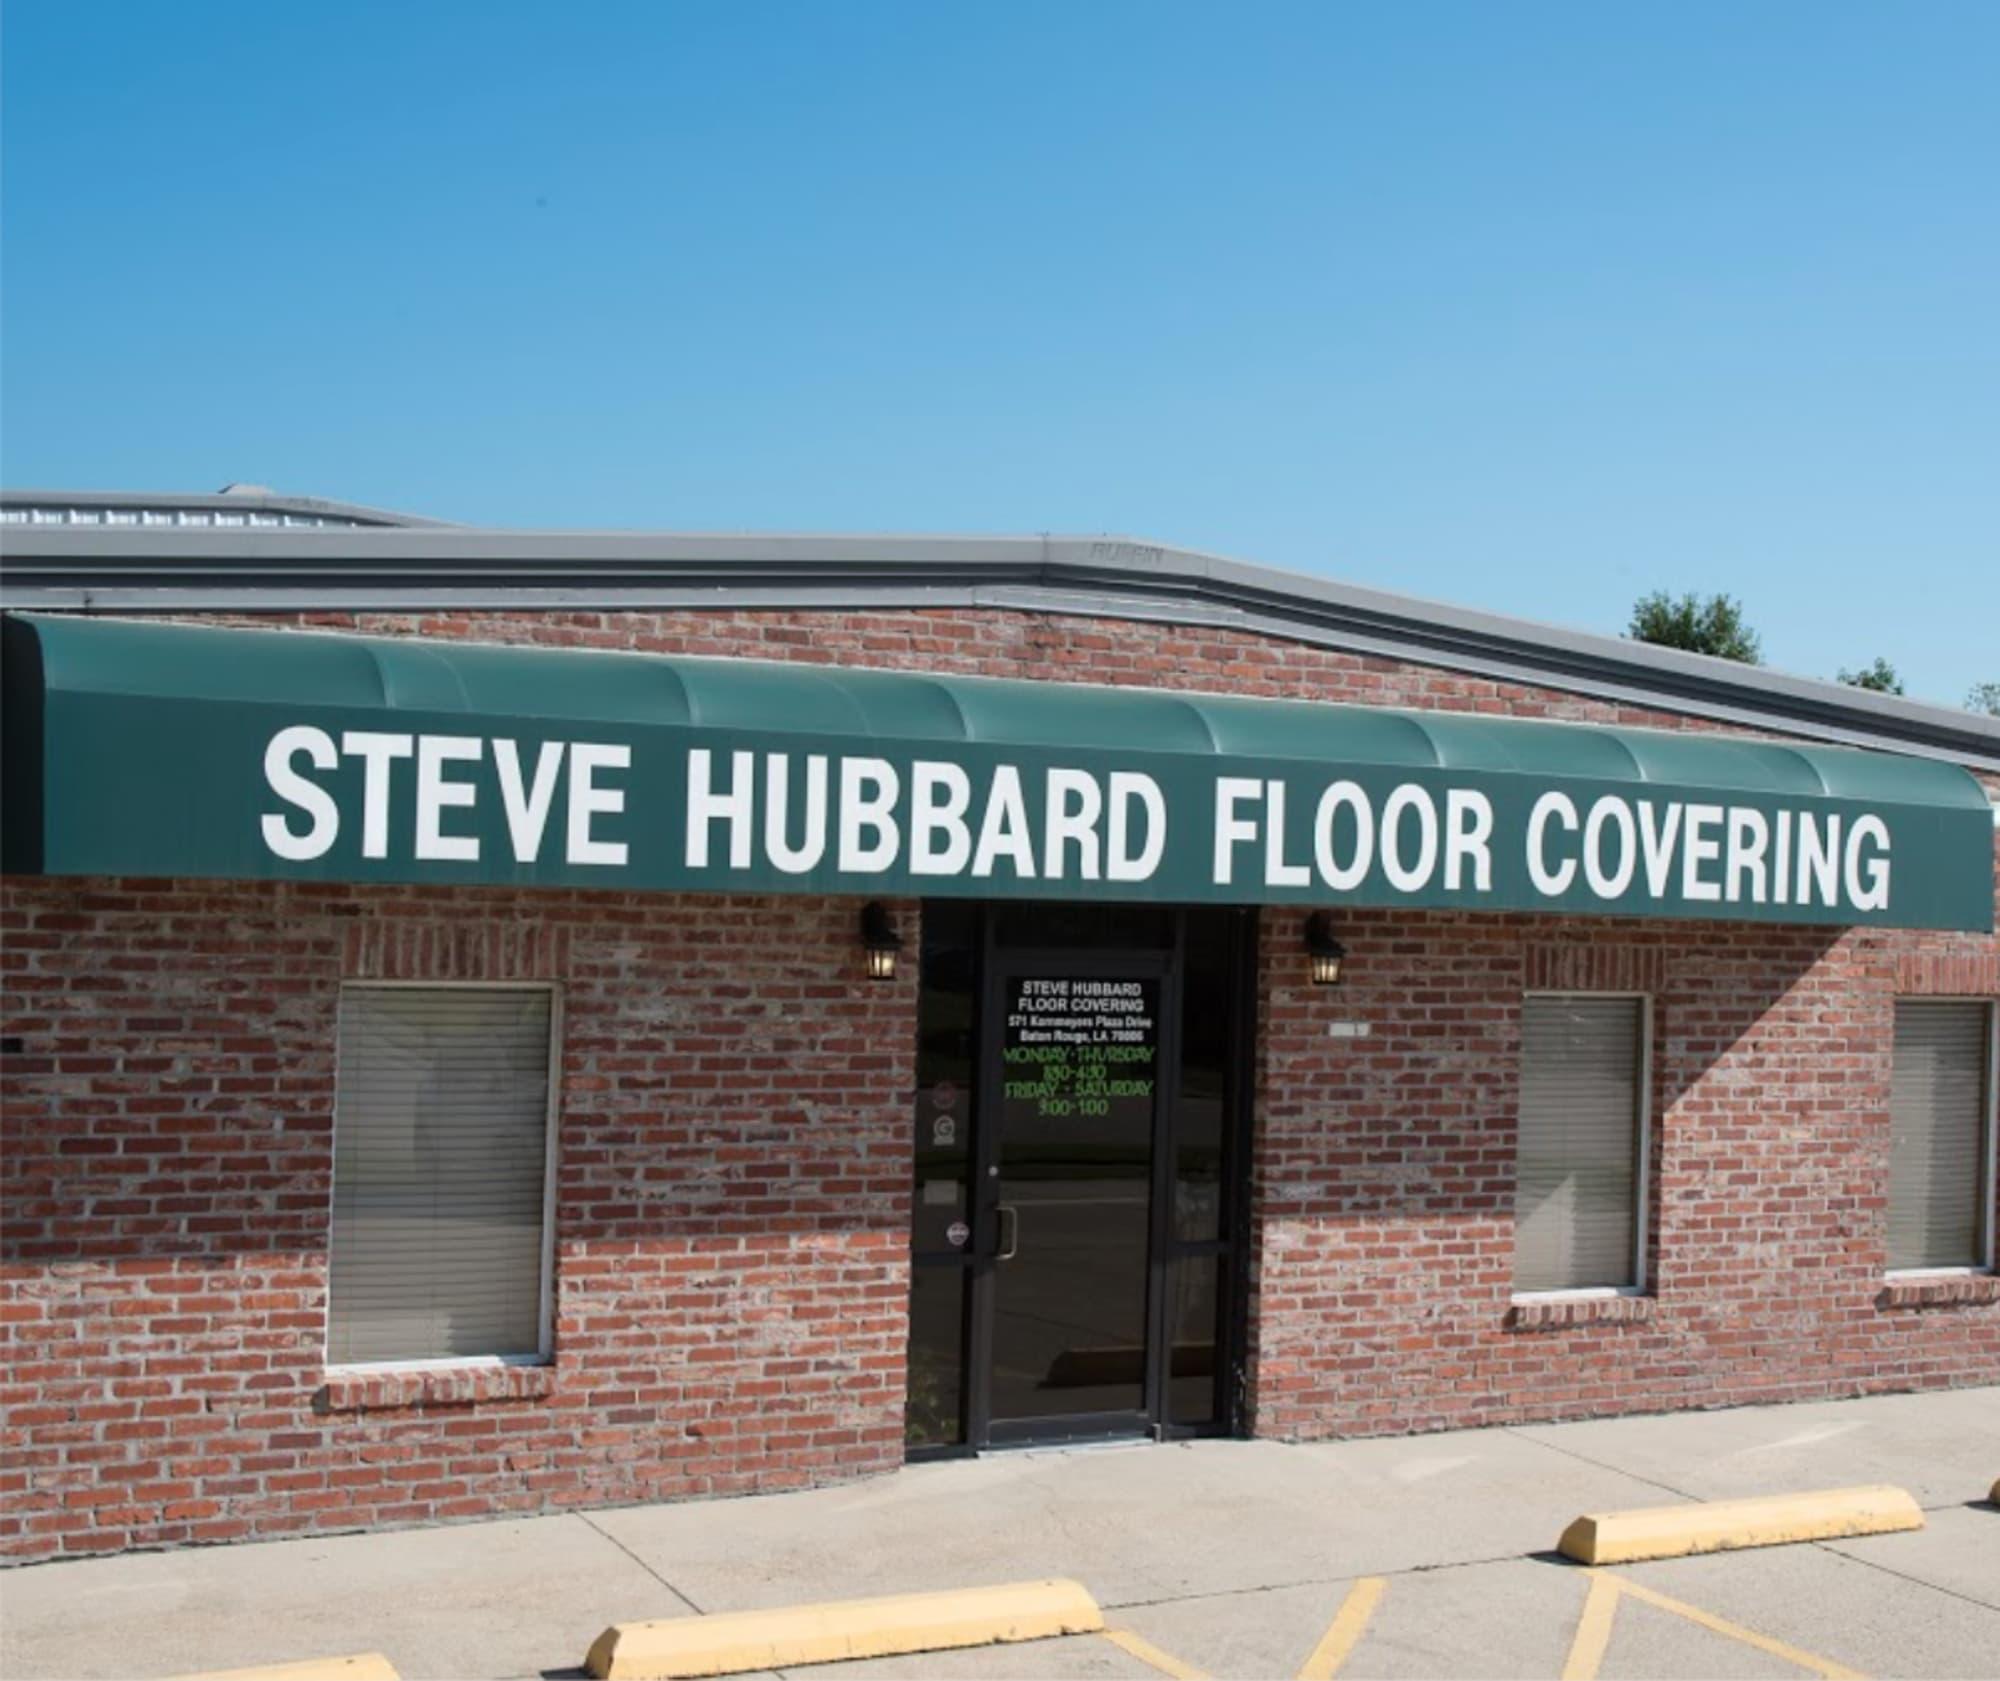 Steve Hubbard Floor Covering - 571 Kornmeyer Plaza Dr Baton Rouge, LA 70806